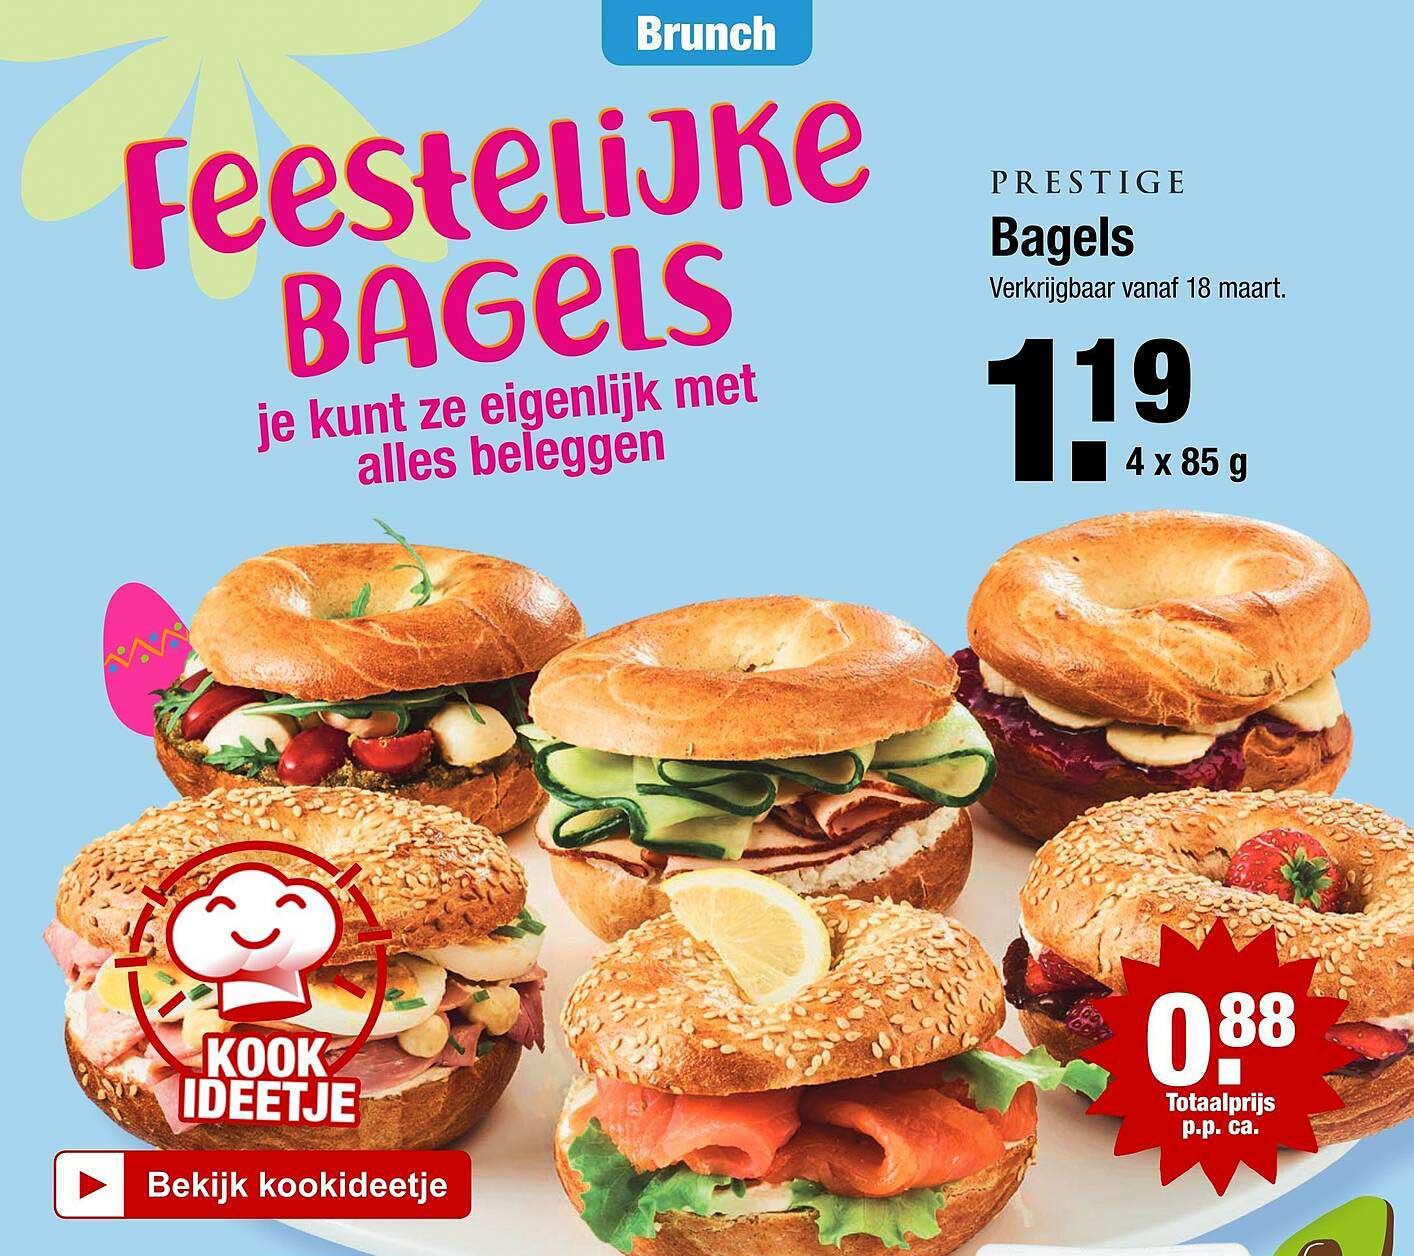 ALDI Prestige Bagels